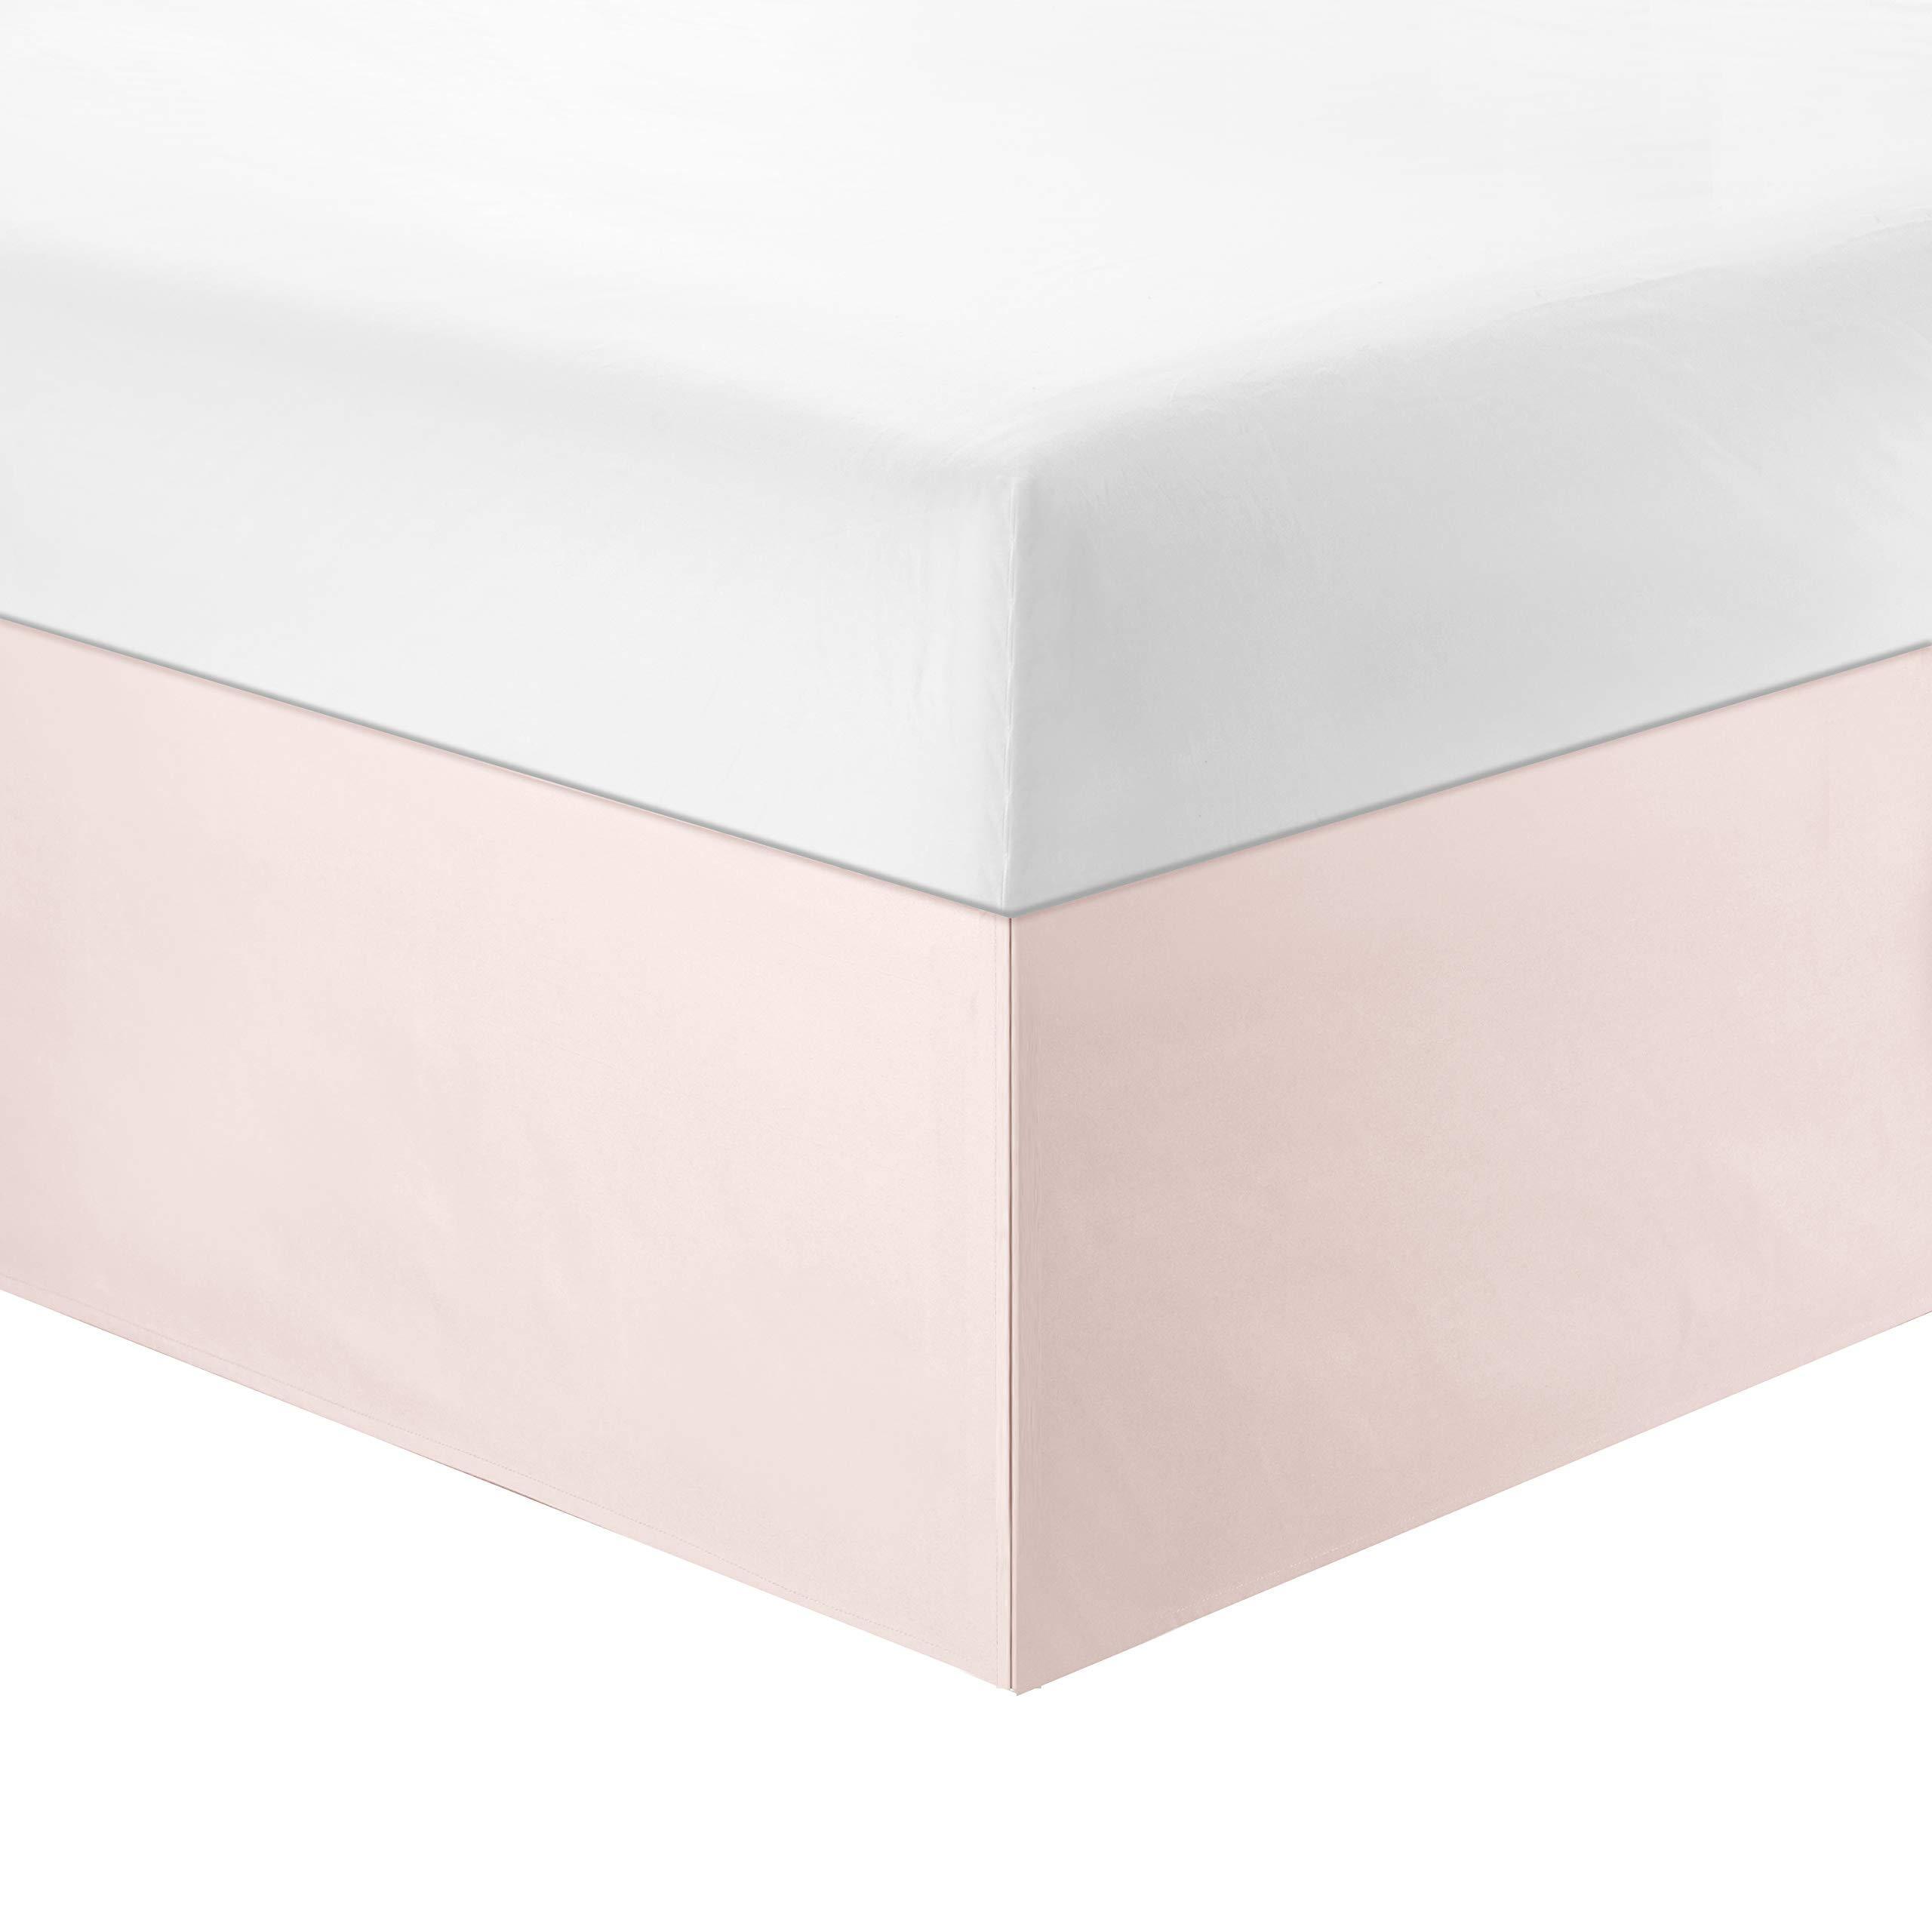 WINLIFE Dust Ruffle Bed Skirt Solid Bed Skirt Wrinkle Resistant Microfiber Bed Skirt 14-inch Drop Pink,Queen